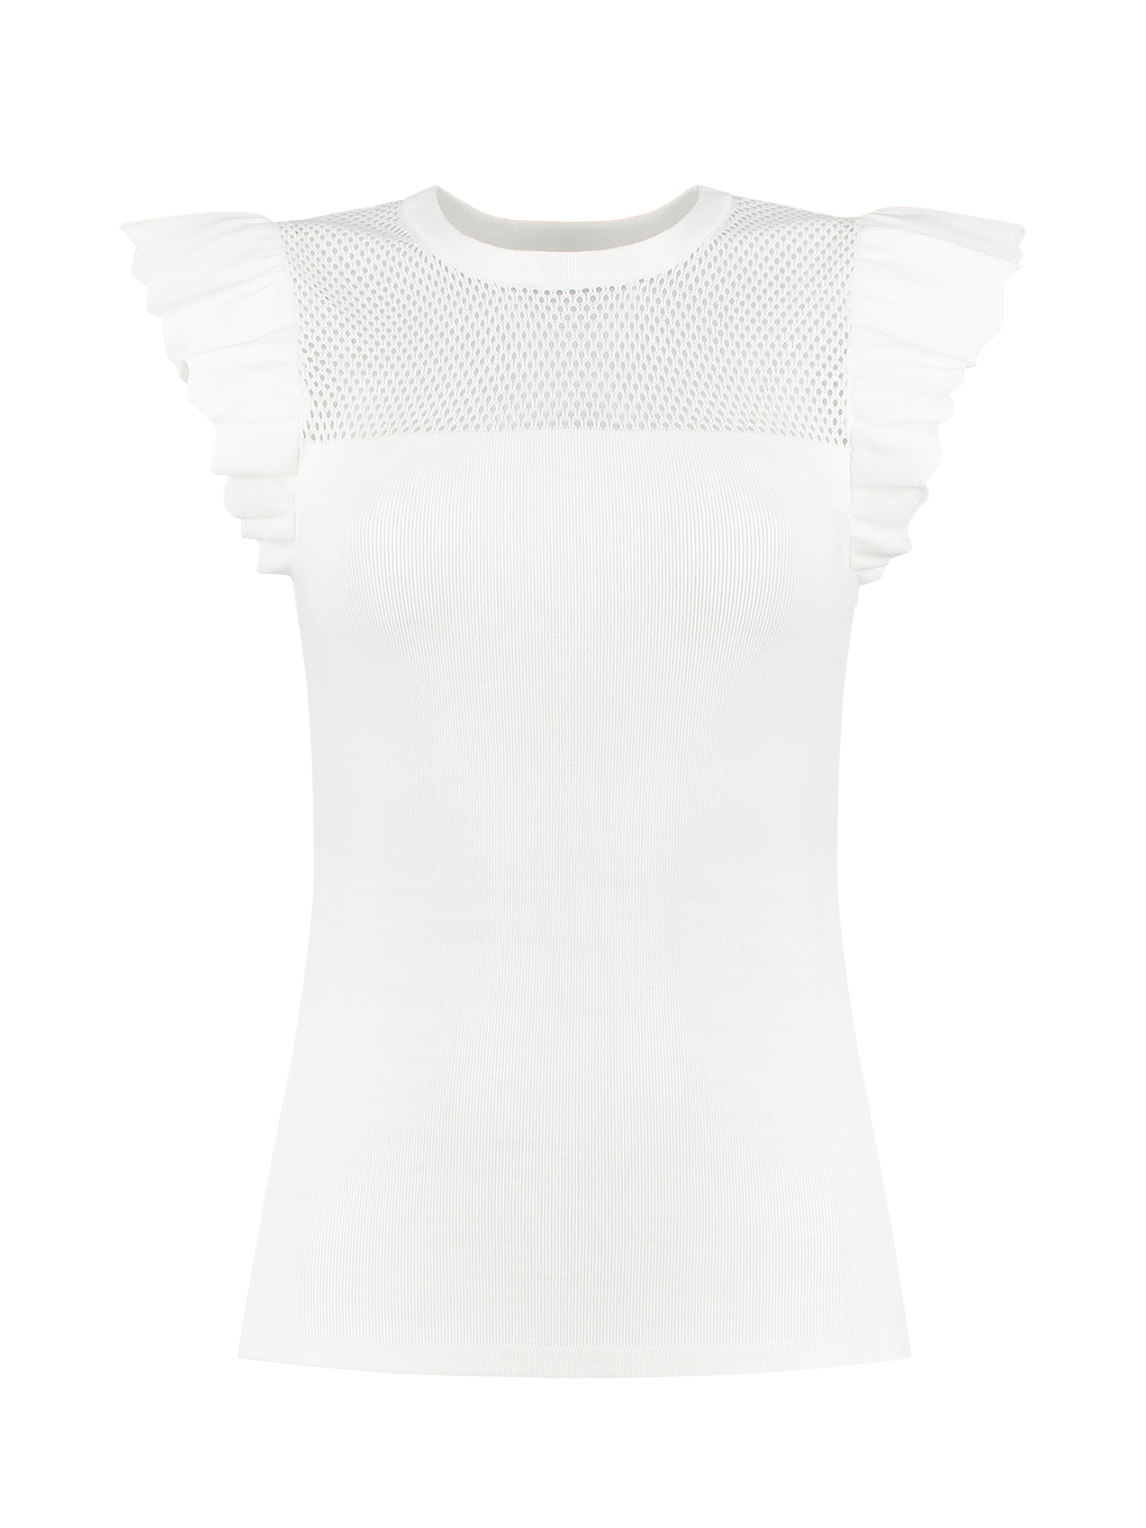 Wit dames shirt met ruches Nikkie - N7-960 1902 2000